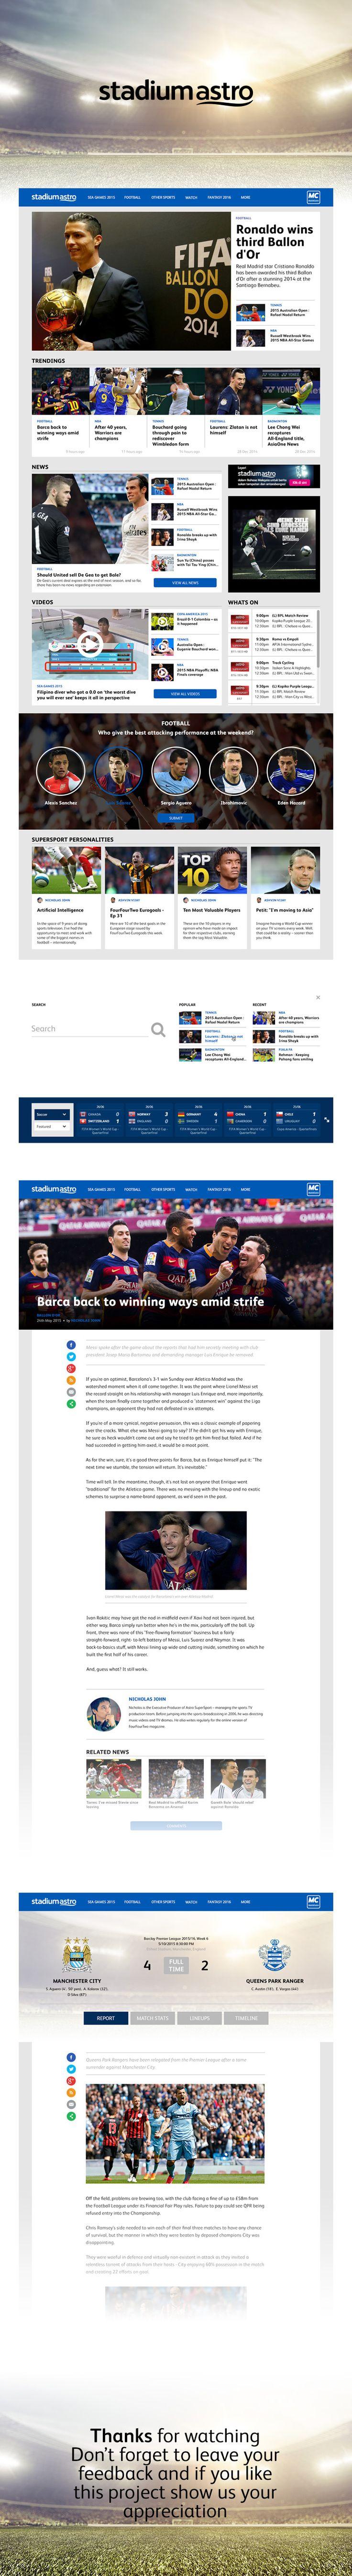 Stadium Astro Website redesign on Behance